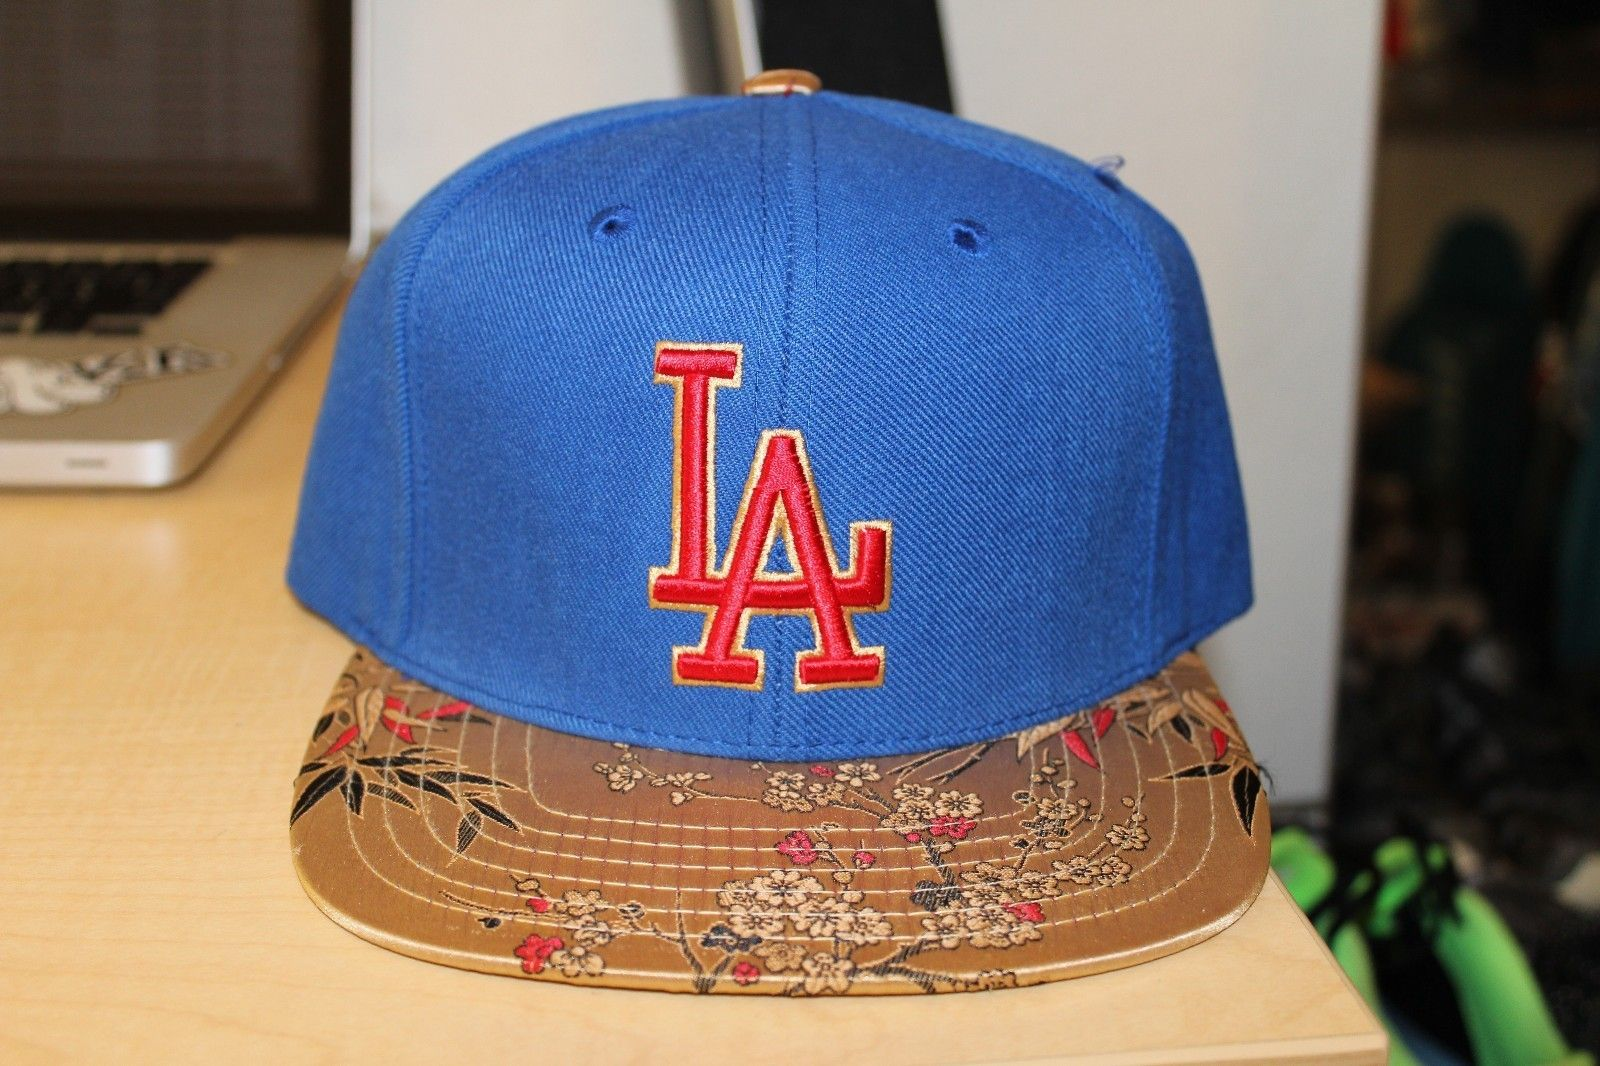 La Dodgers Japanese Print Snapback Gold Los Angeles American Needle Strapback